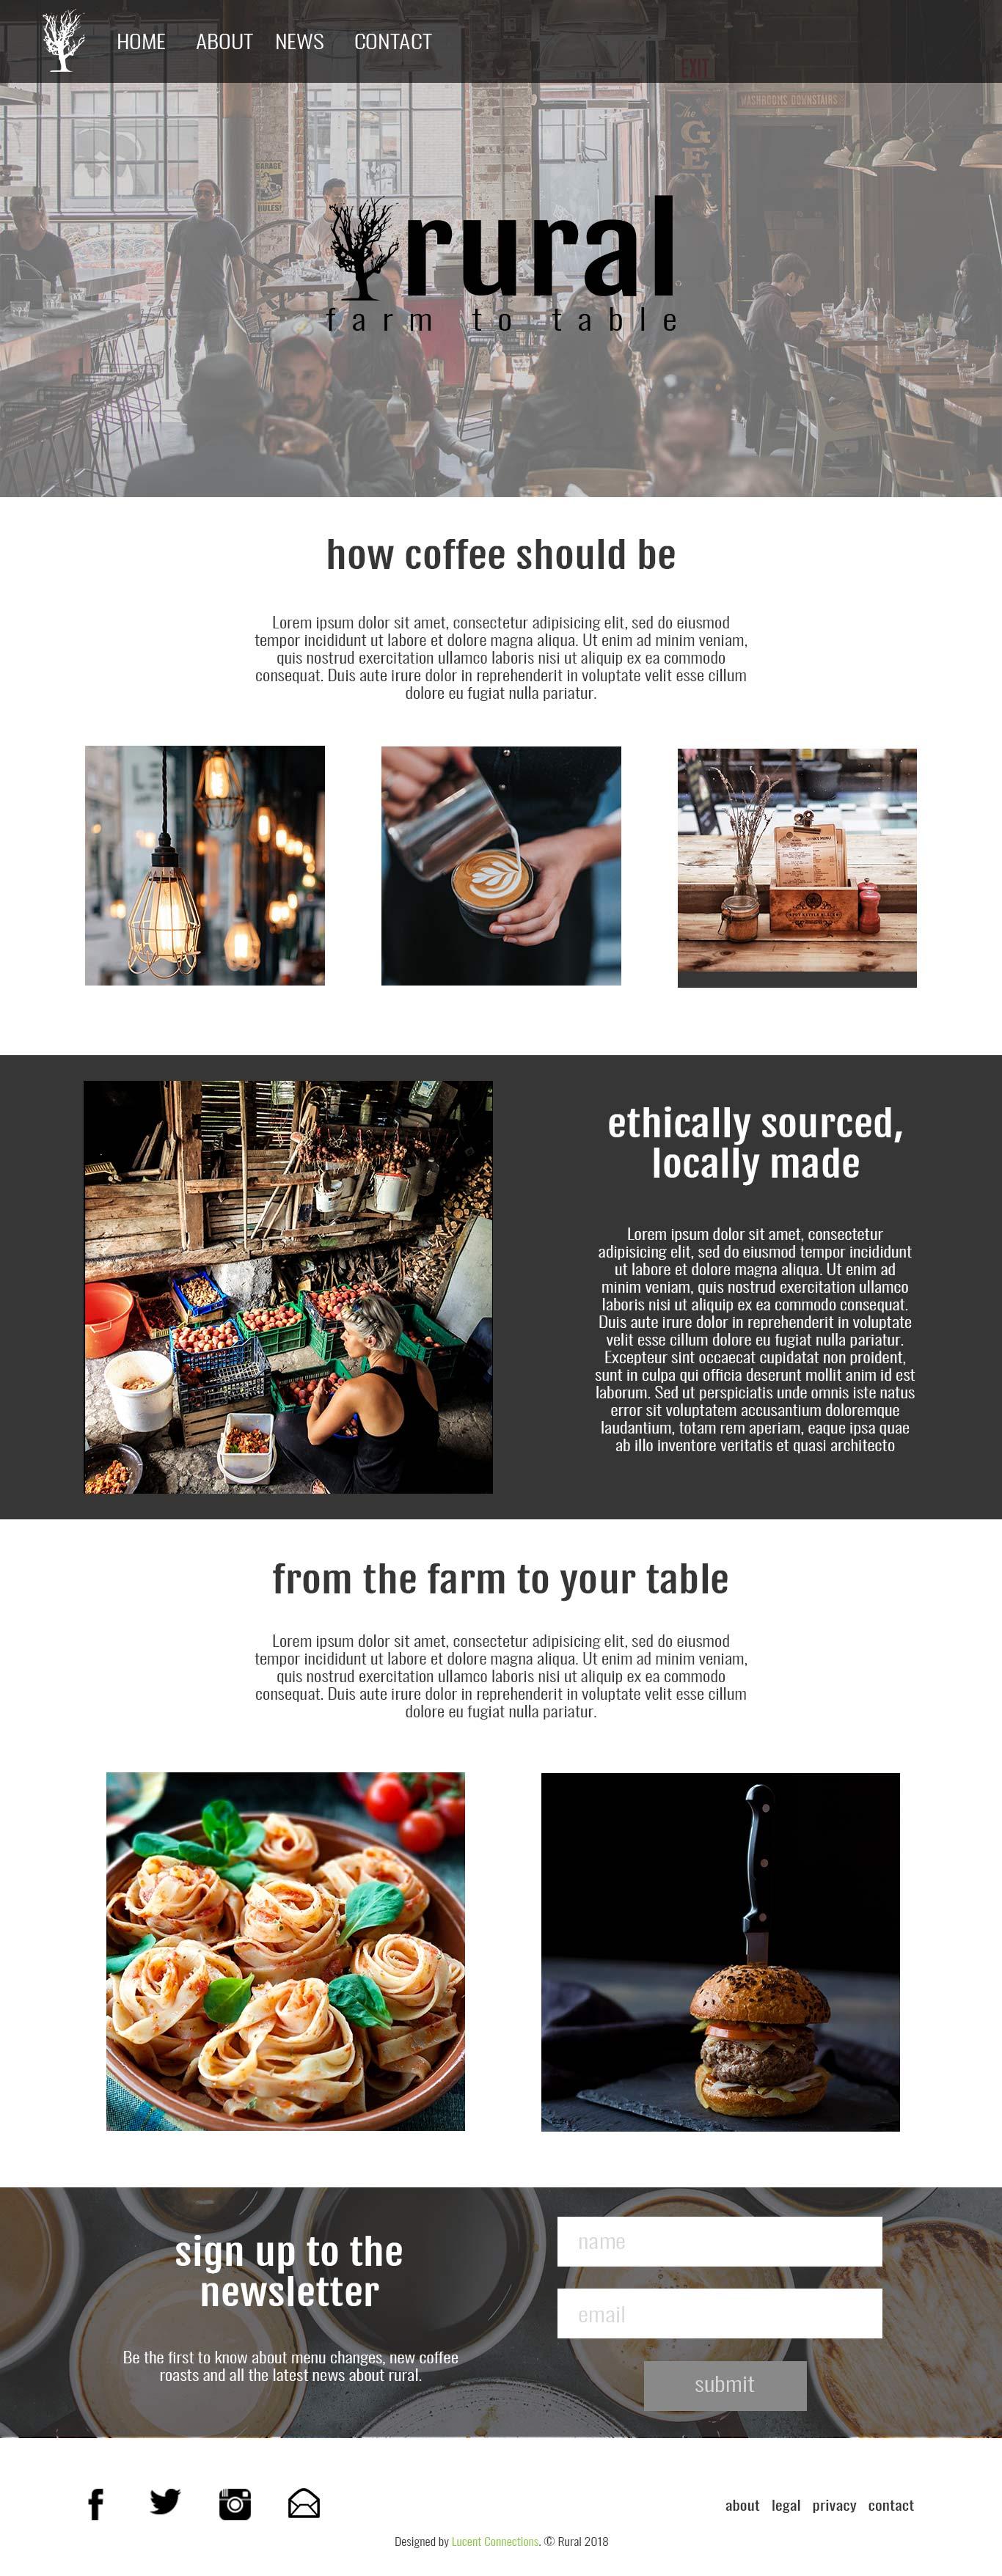 a local cafe website design